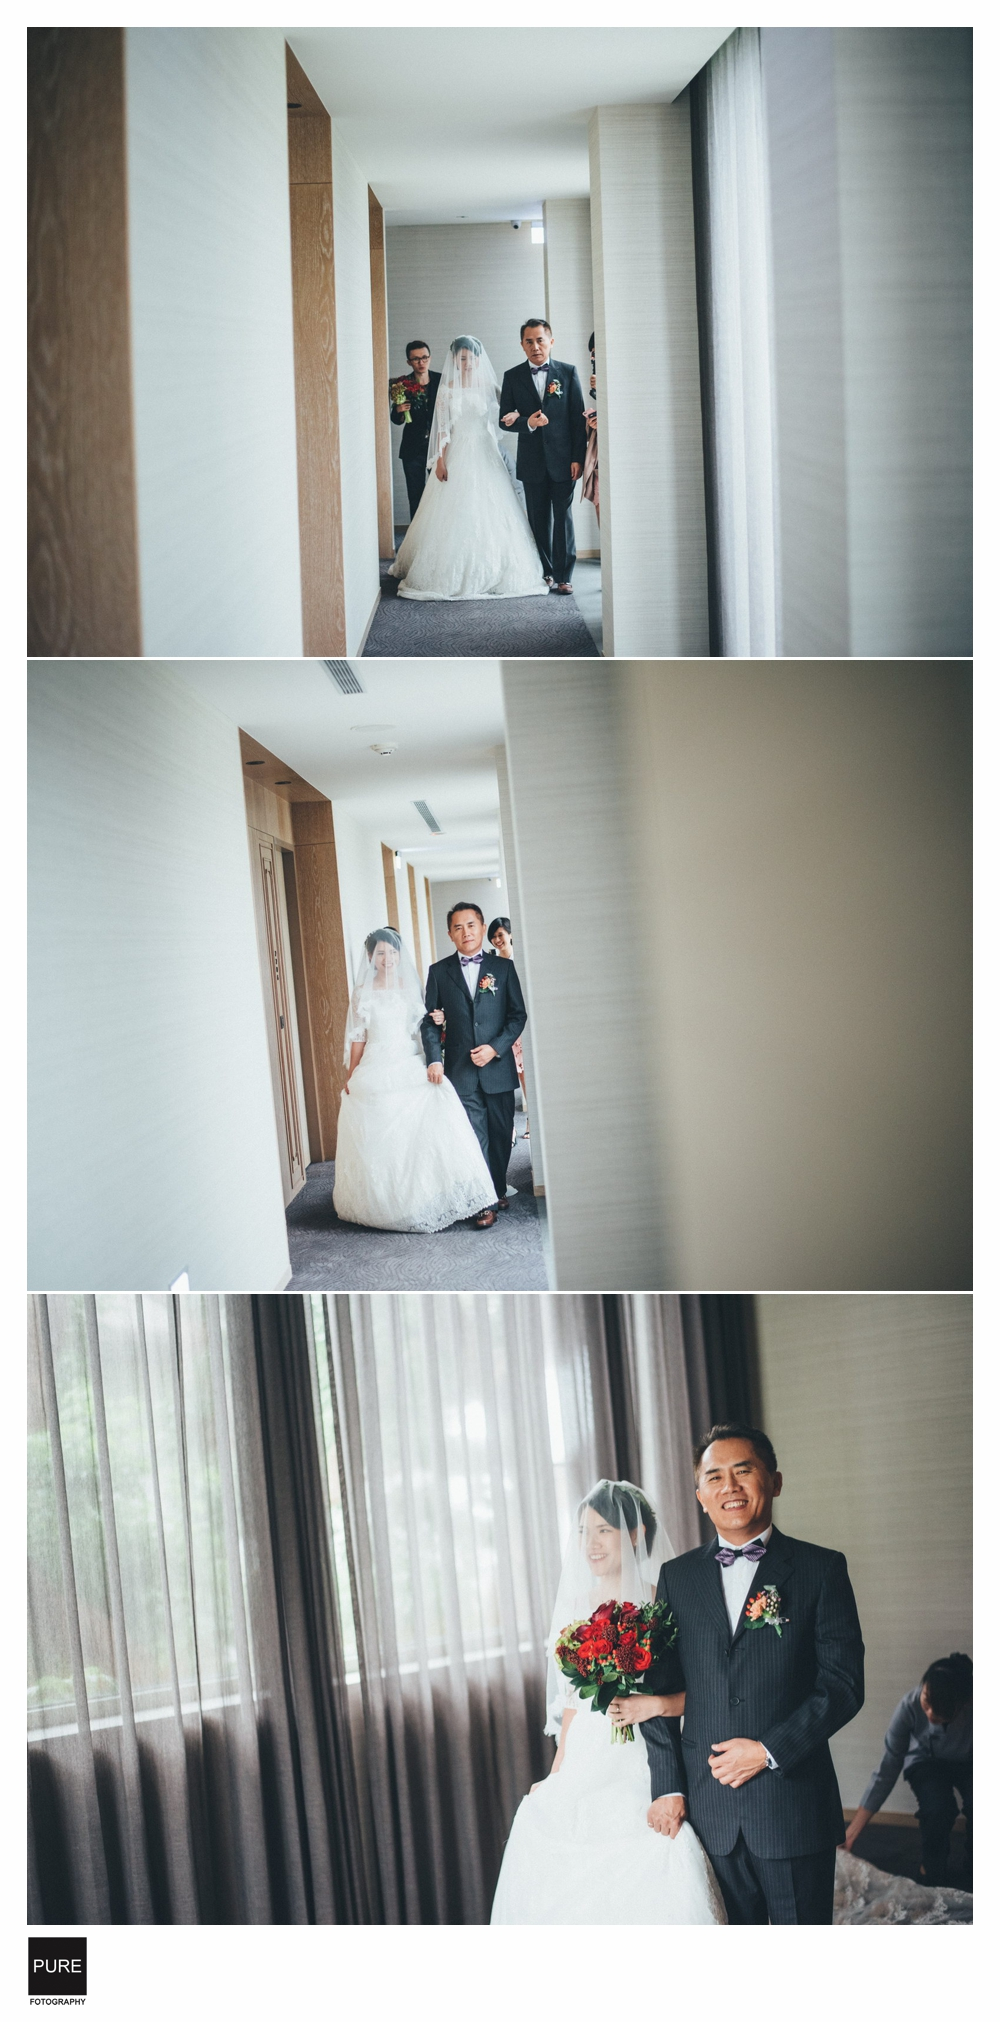 PUREFOTO_台灣婚禮平面攝影wedding_華泰瑞苑PUREFOTO婚禮攝影